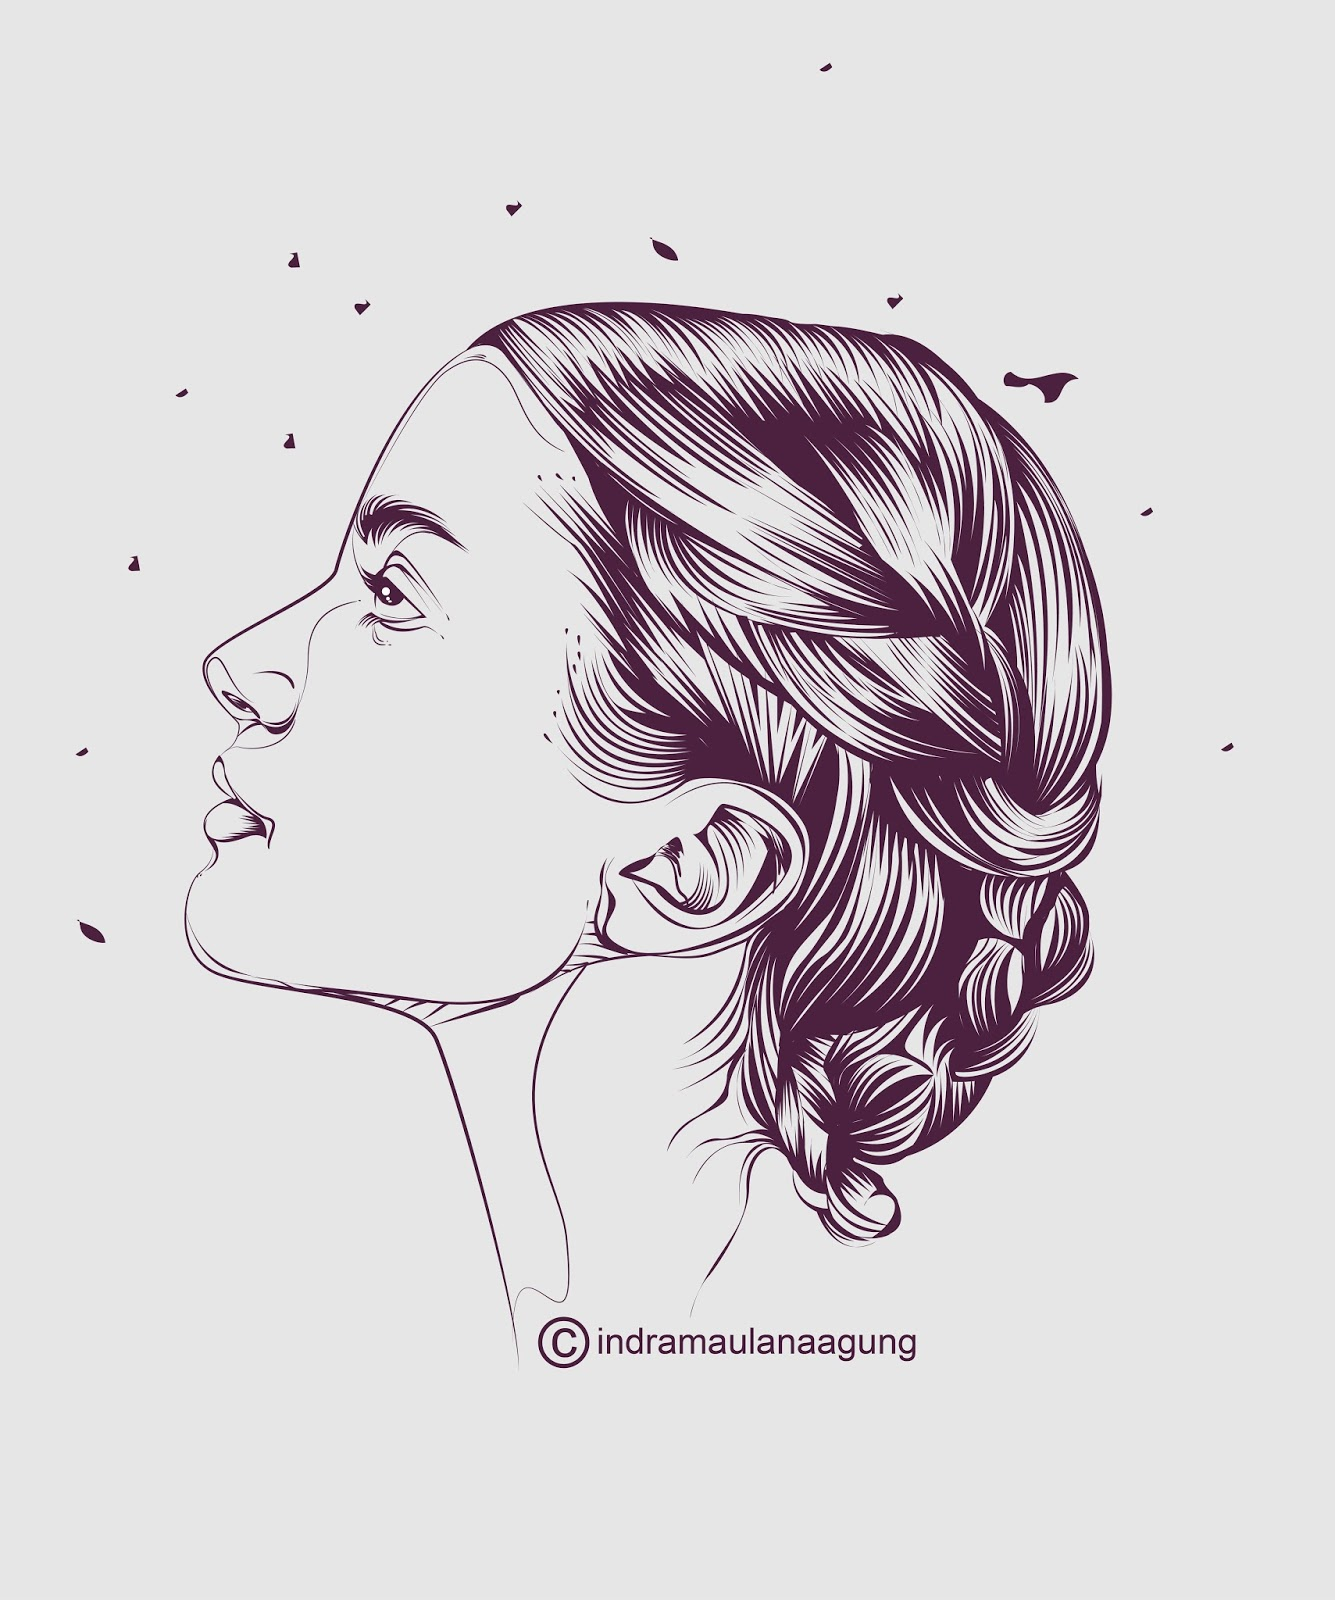 Line Art Adobe Illustrator : Adobe illustrator tutorial line art ideosprocess